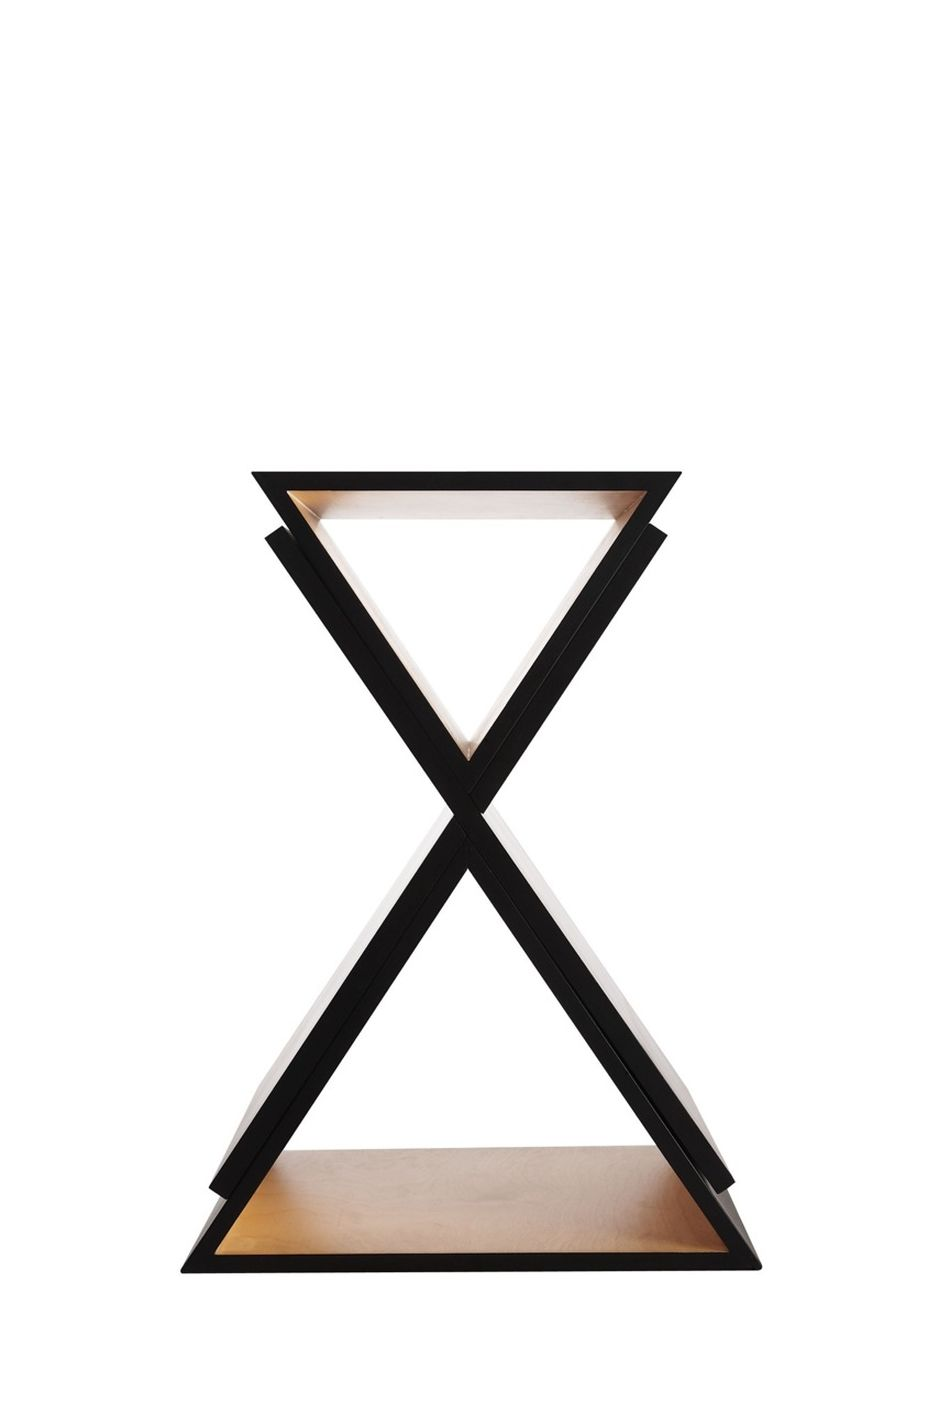 www.newtendency.de/x-chair X Chair